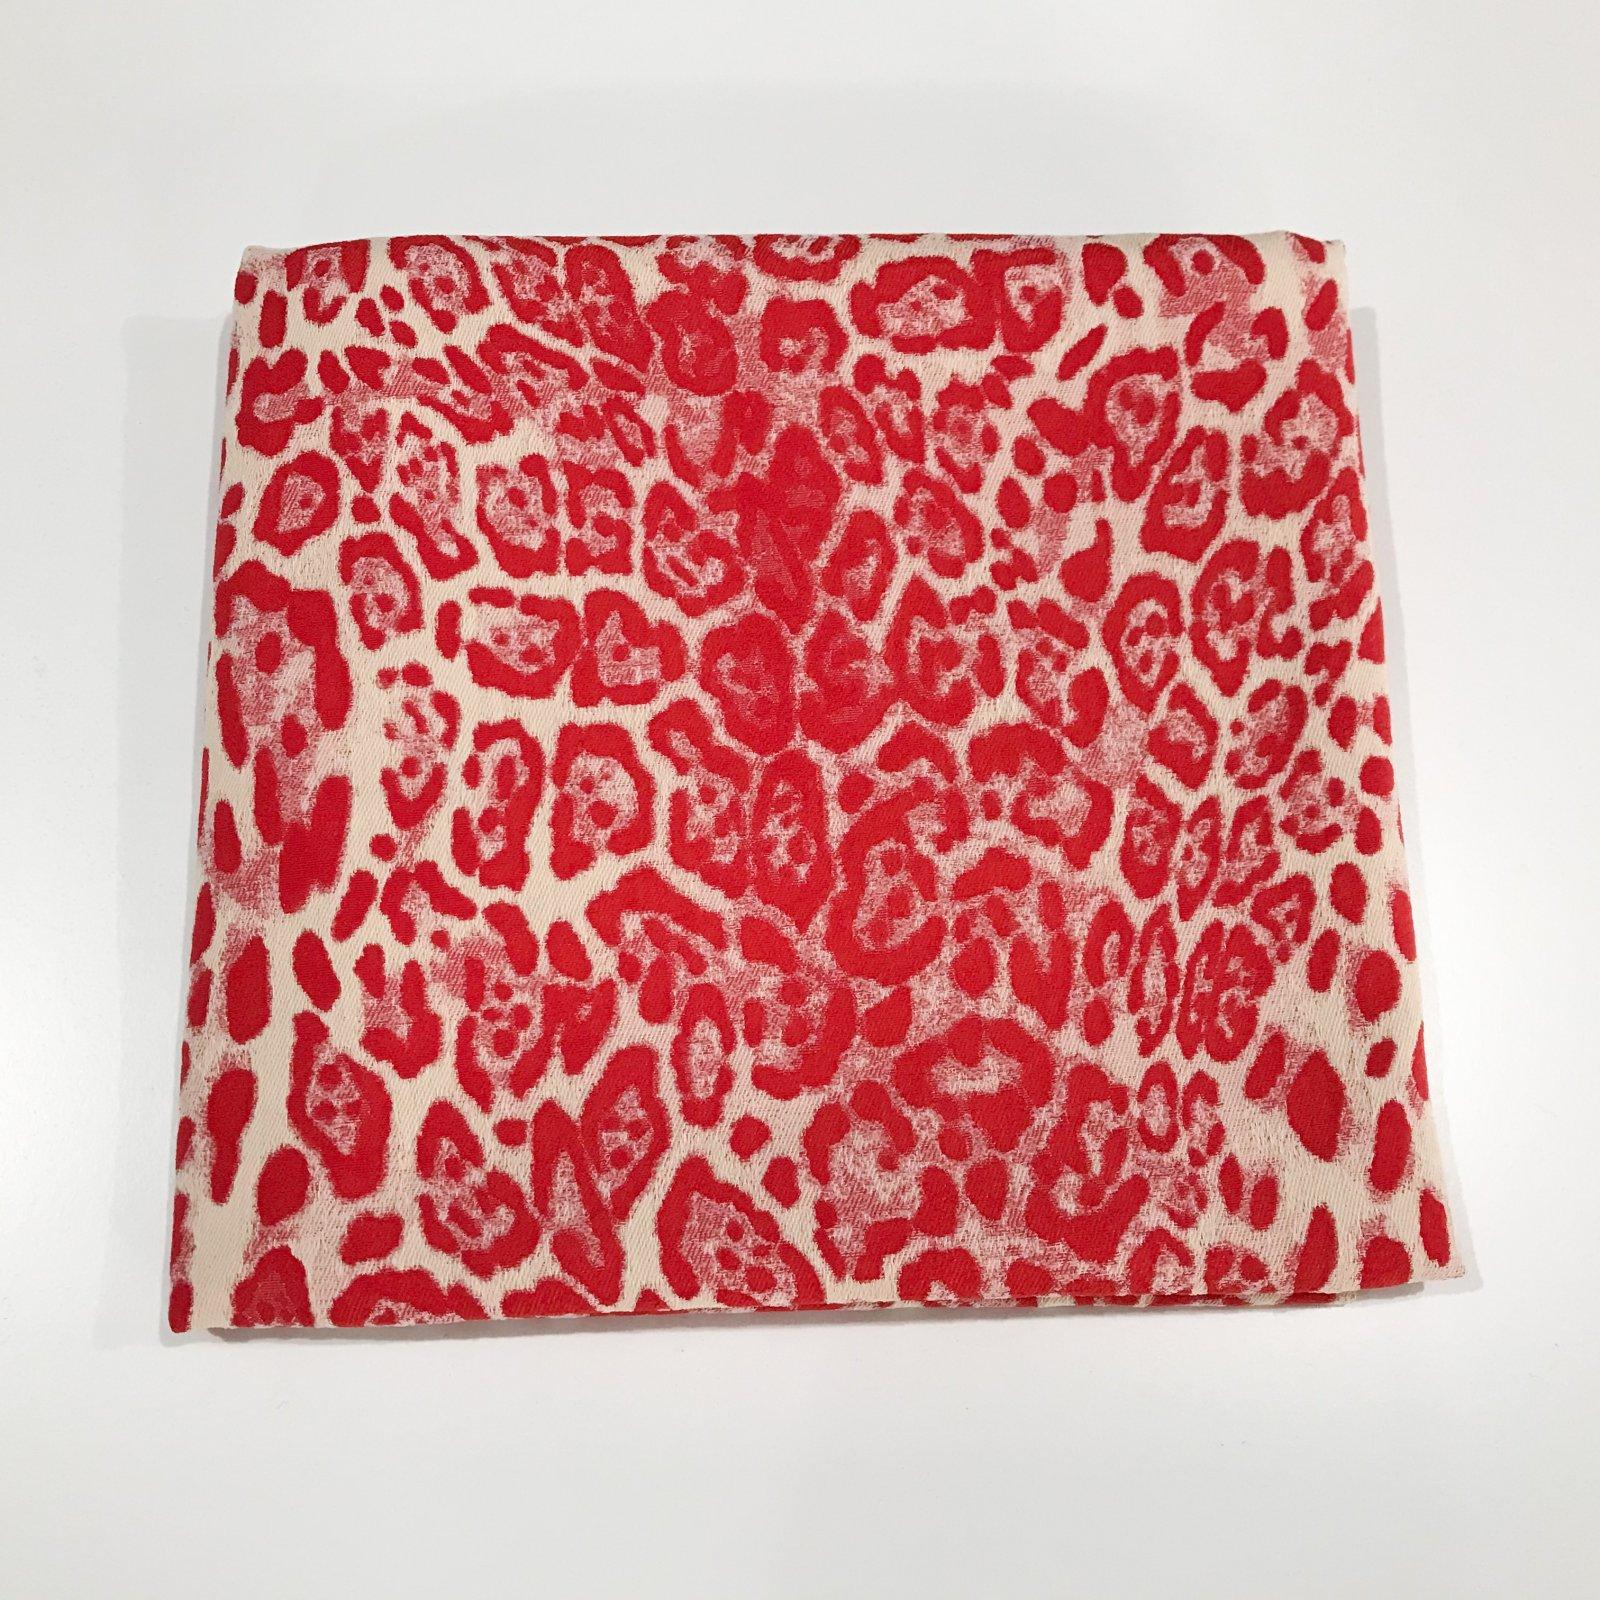 30 inches - Elie Tahari Blaze Red Leopard Jacquard